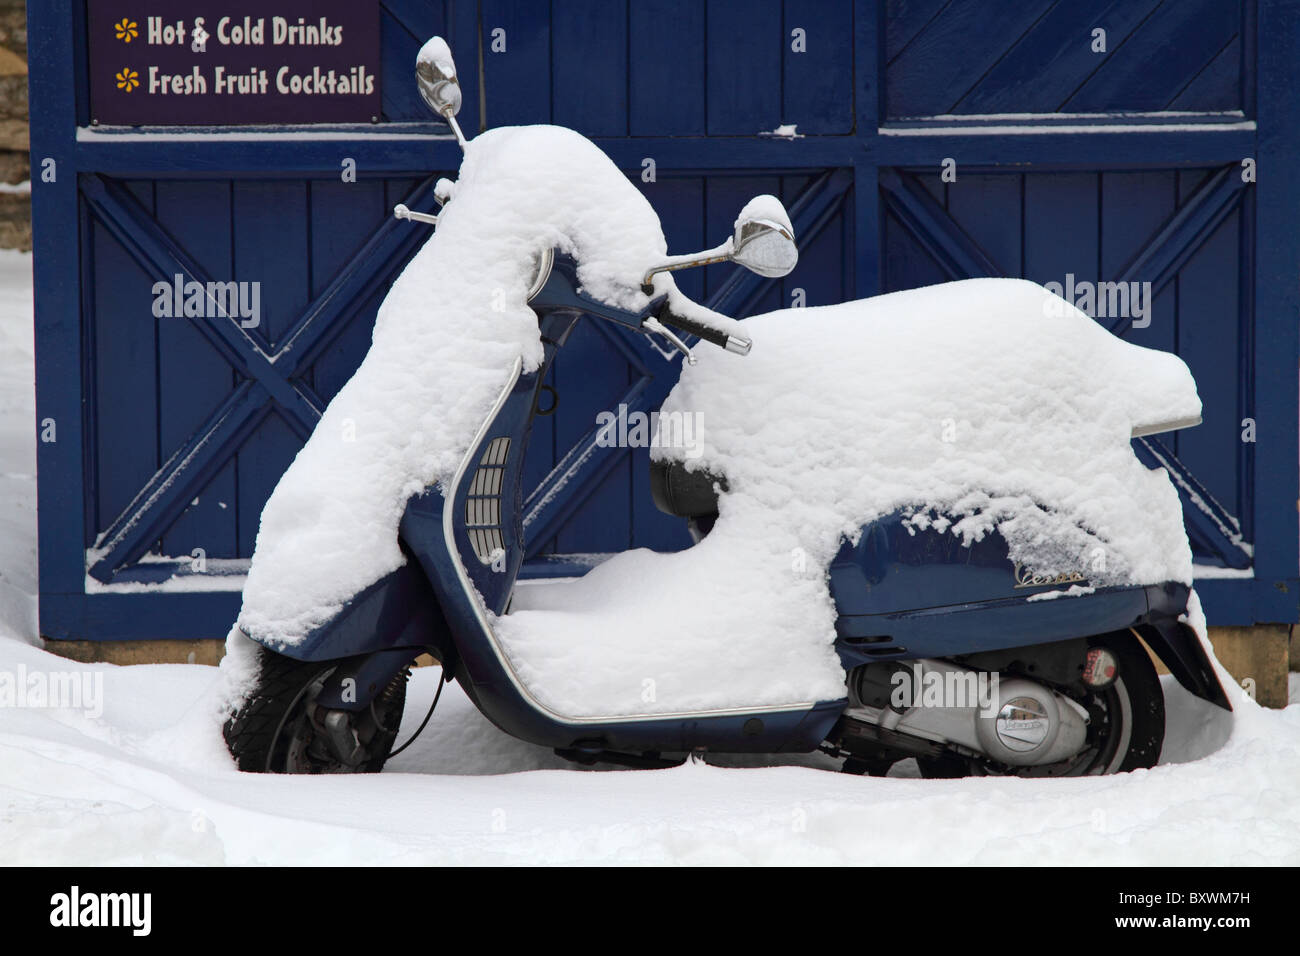 Scooters Vespa moto neige Neige Neige hiver véhicule Photo Stock